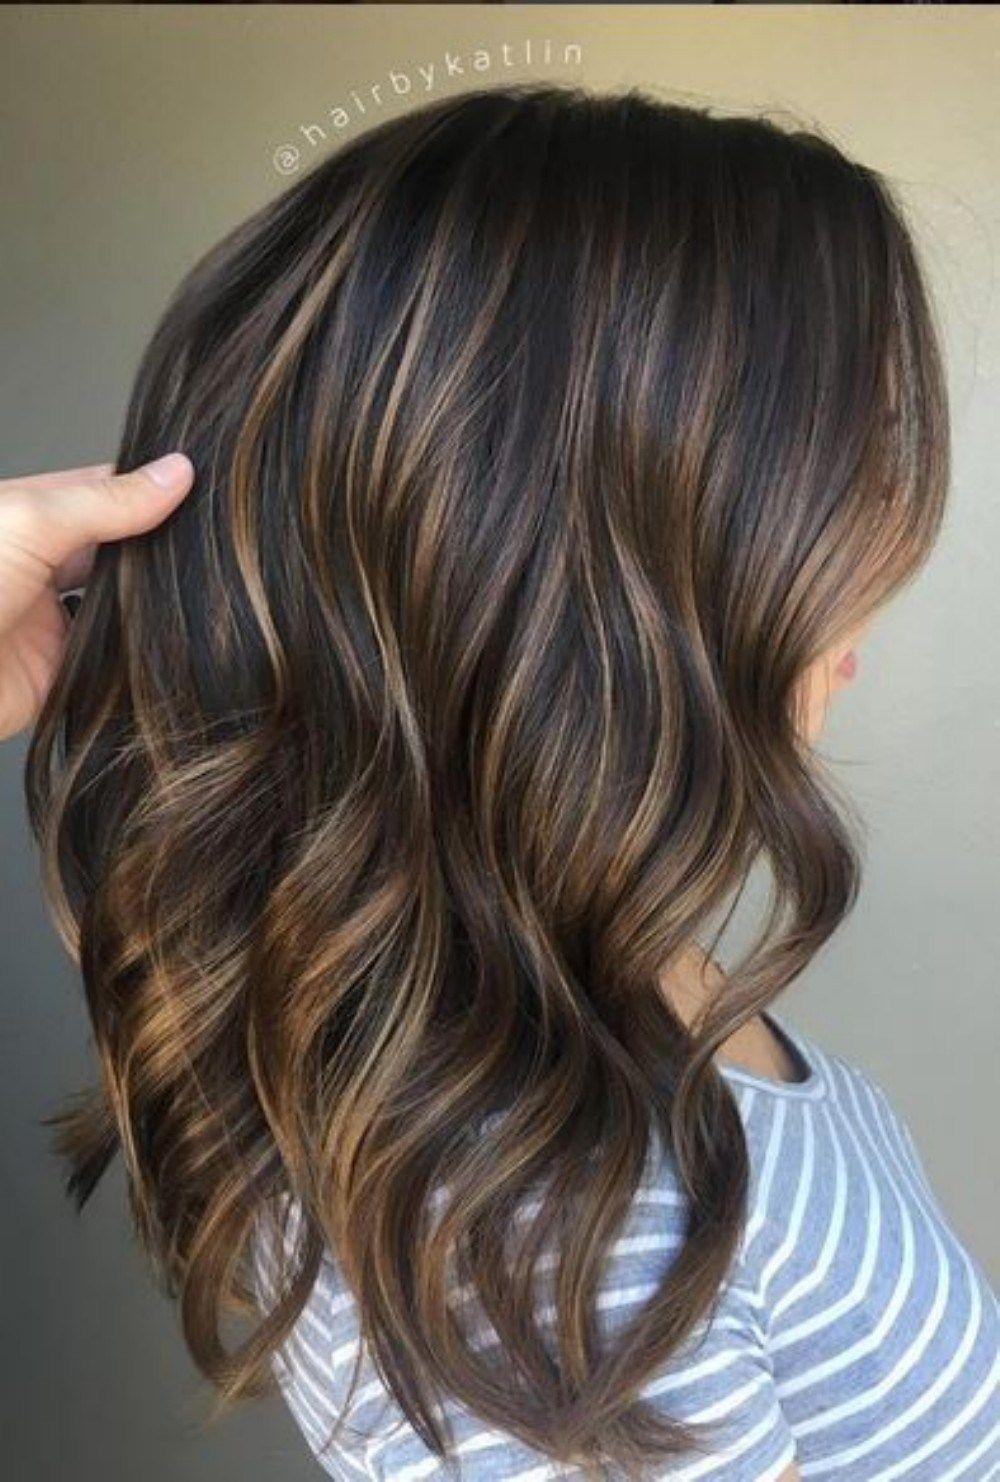 25 Top Brunette Hair Color Ideas to Try 2017 | Brunette hair, Hair ...